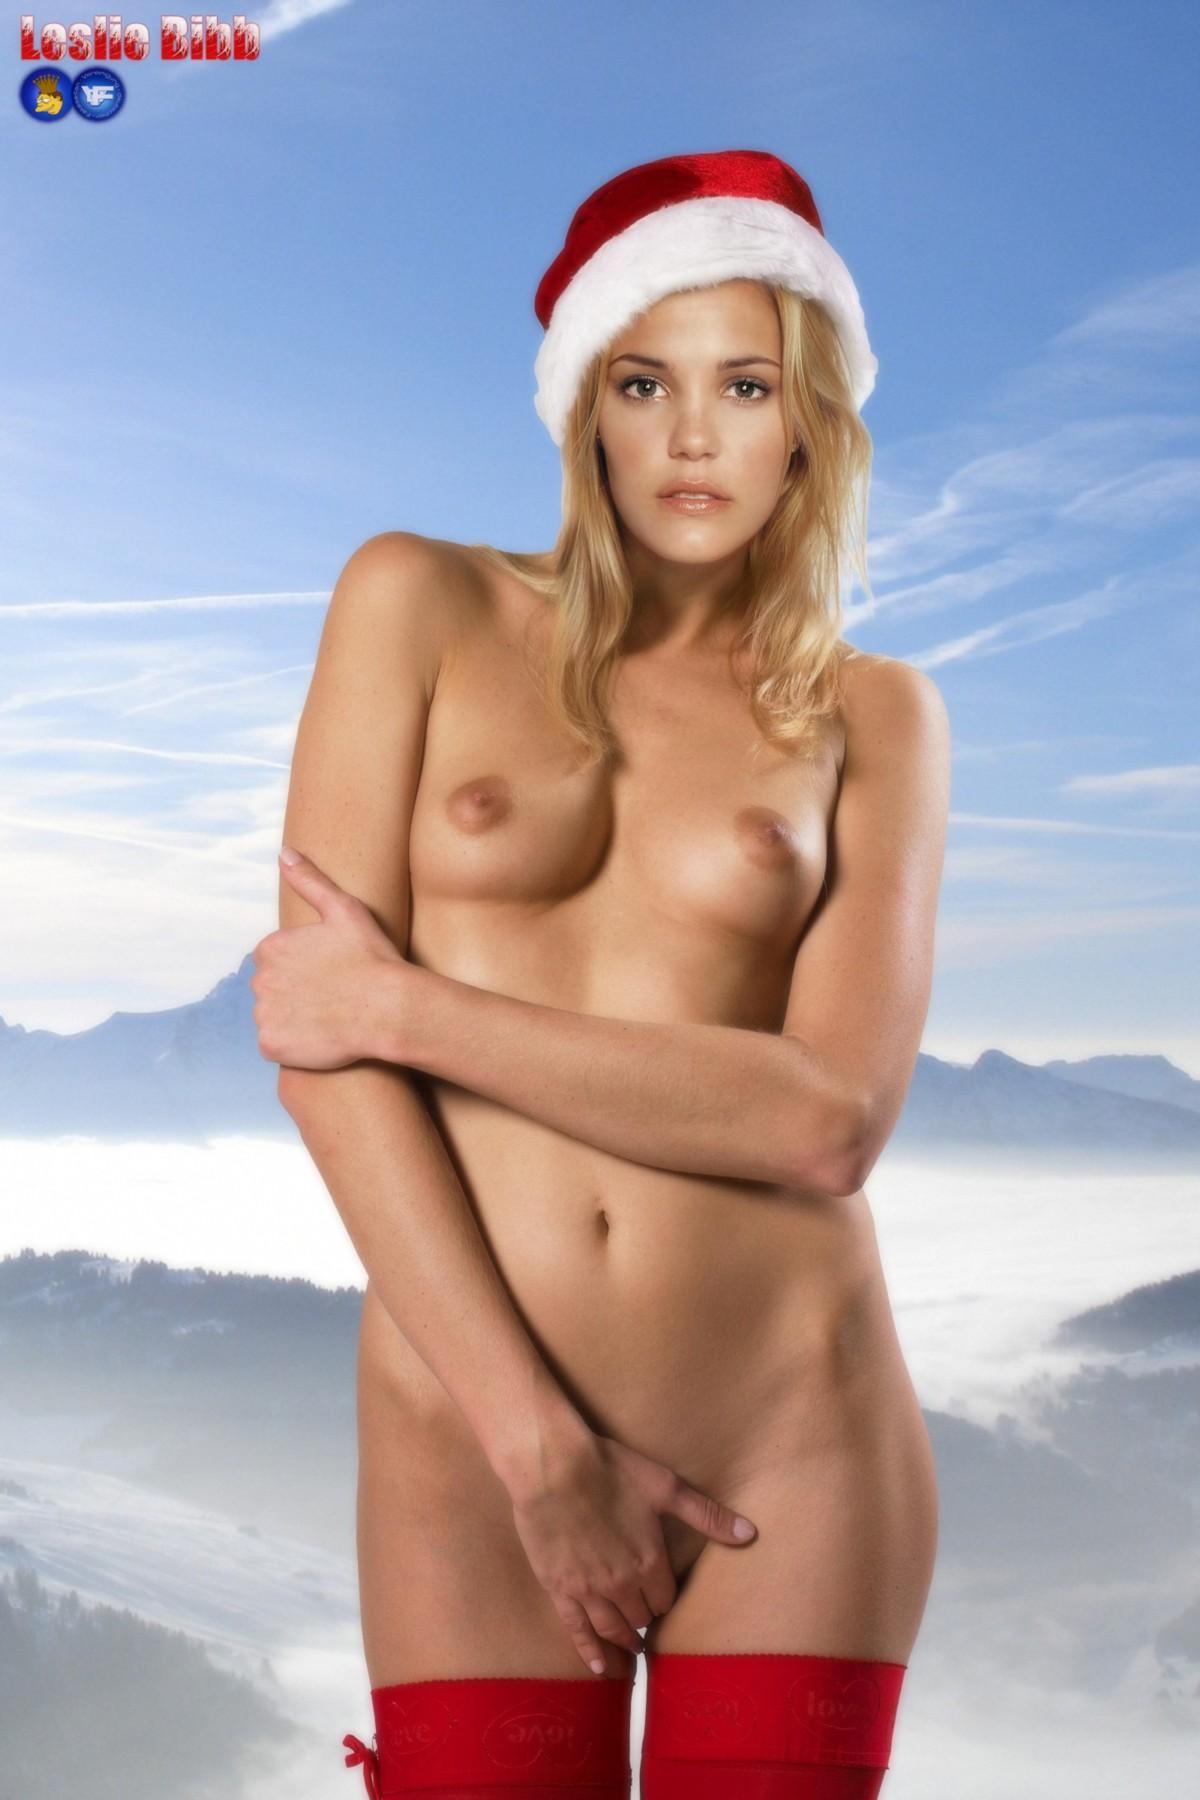 Leslie bibb sexy nipples of narnia